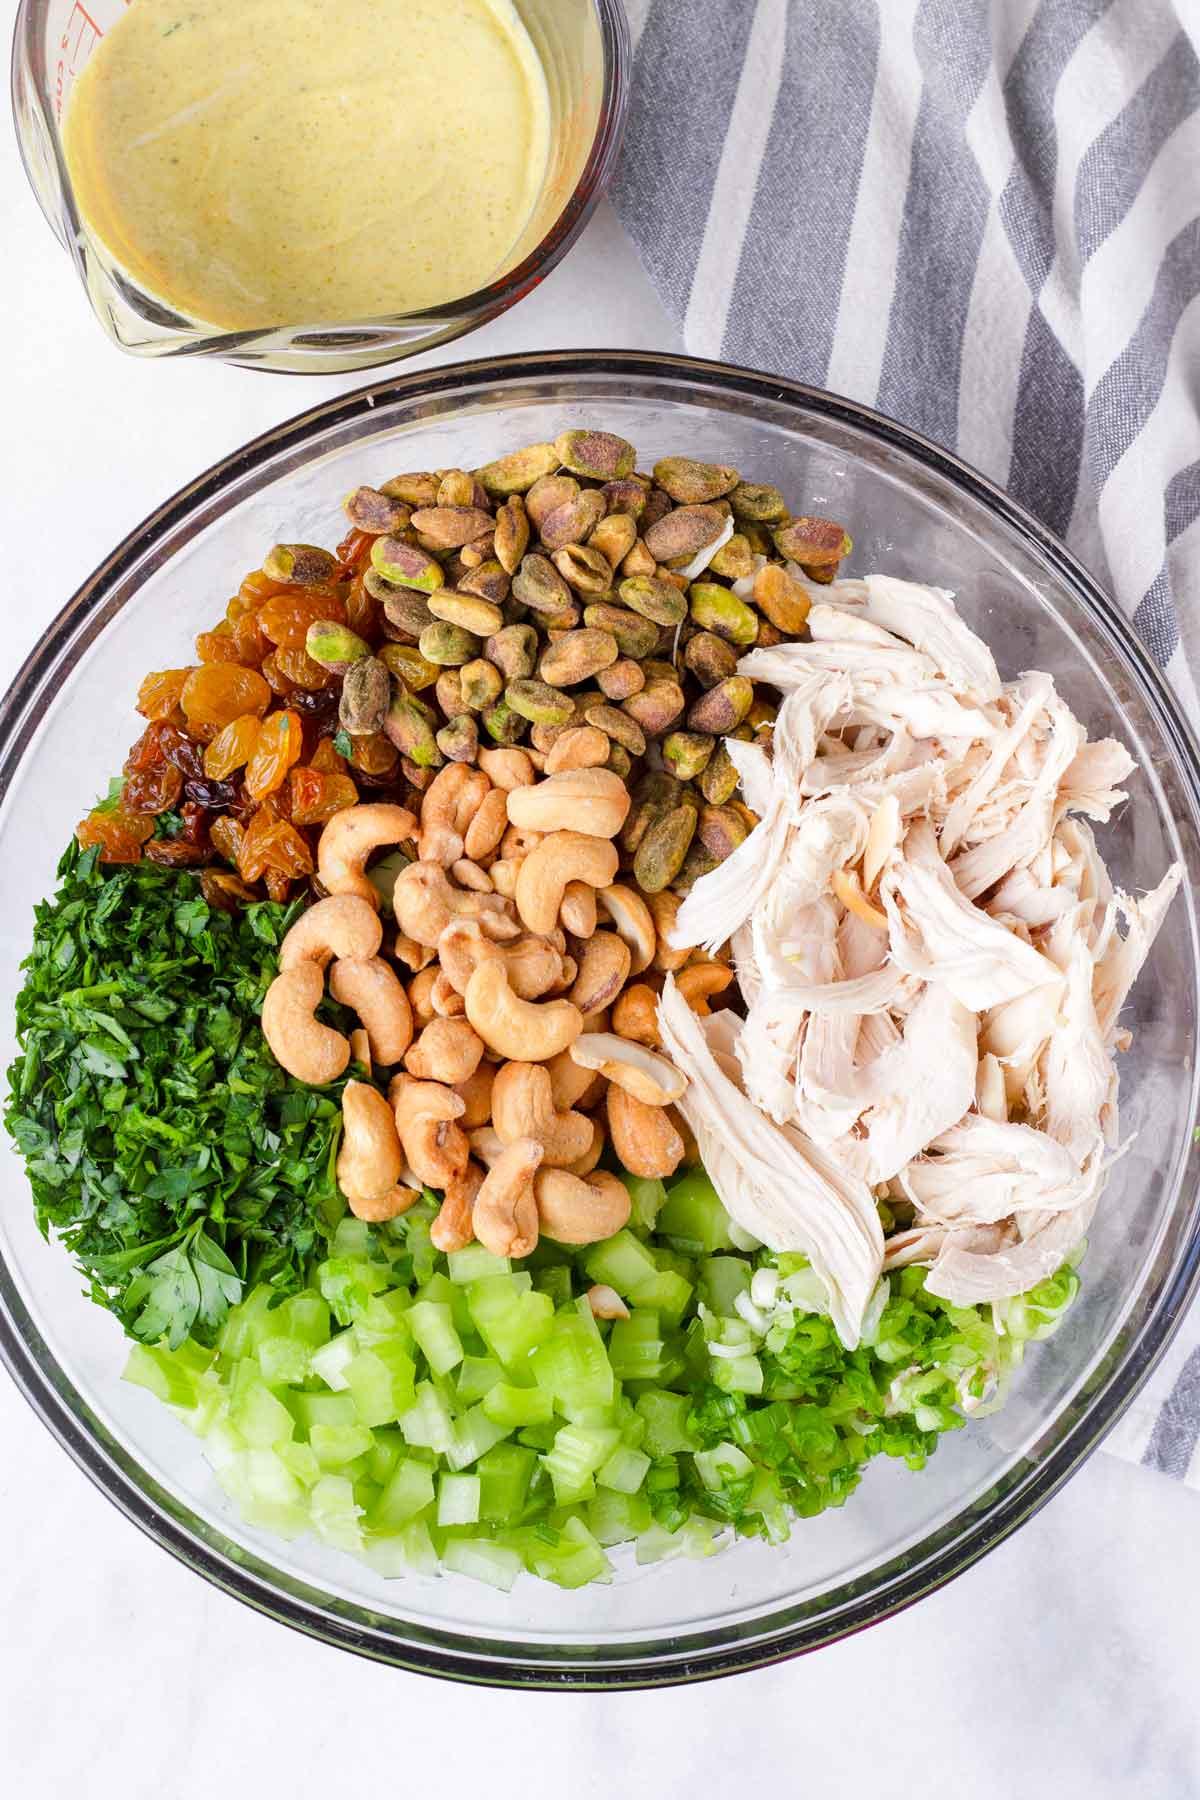 parsley, golden raisins, pistachios, cashews, celery, scallions, shredded chicken in bowl